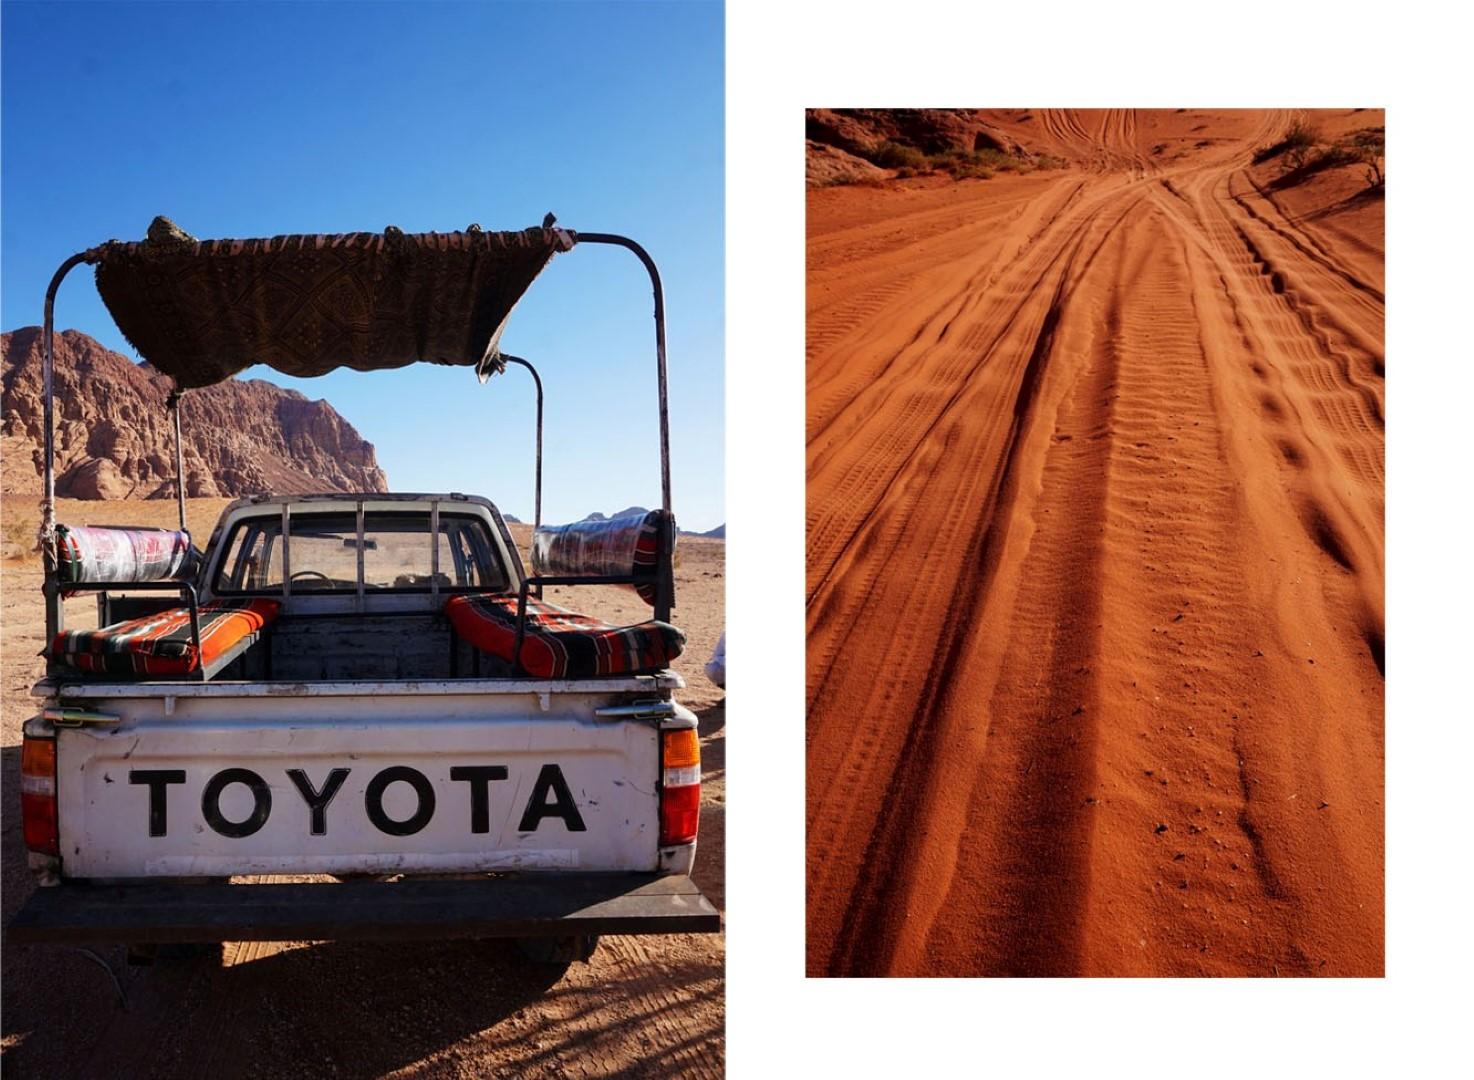 Voyage en Jordanie - Petra Wadi-Rum - Désert du Wadi-Rum